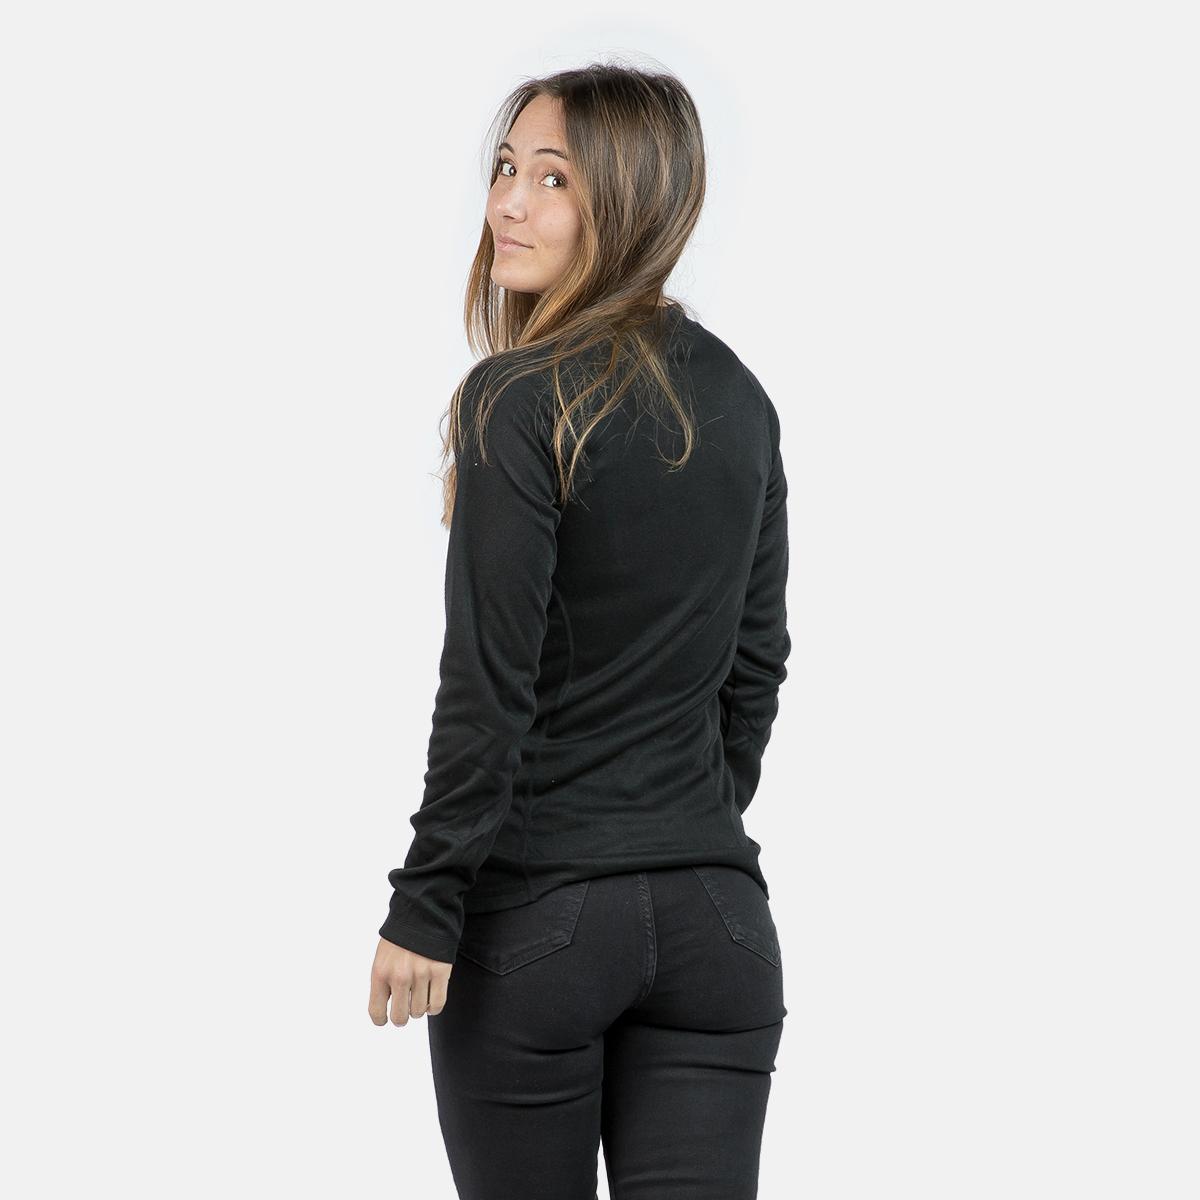 WOMAN'S ANAGA THERMAL T-SHIRT BLACK